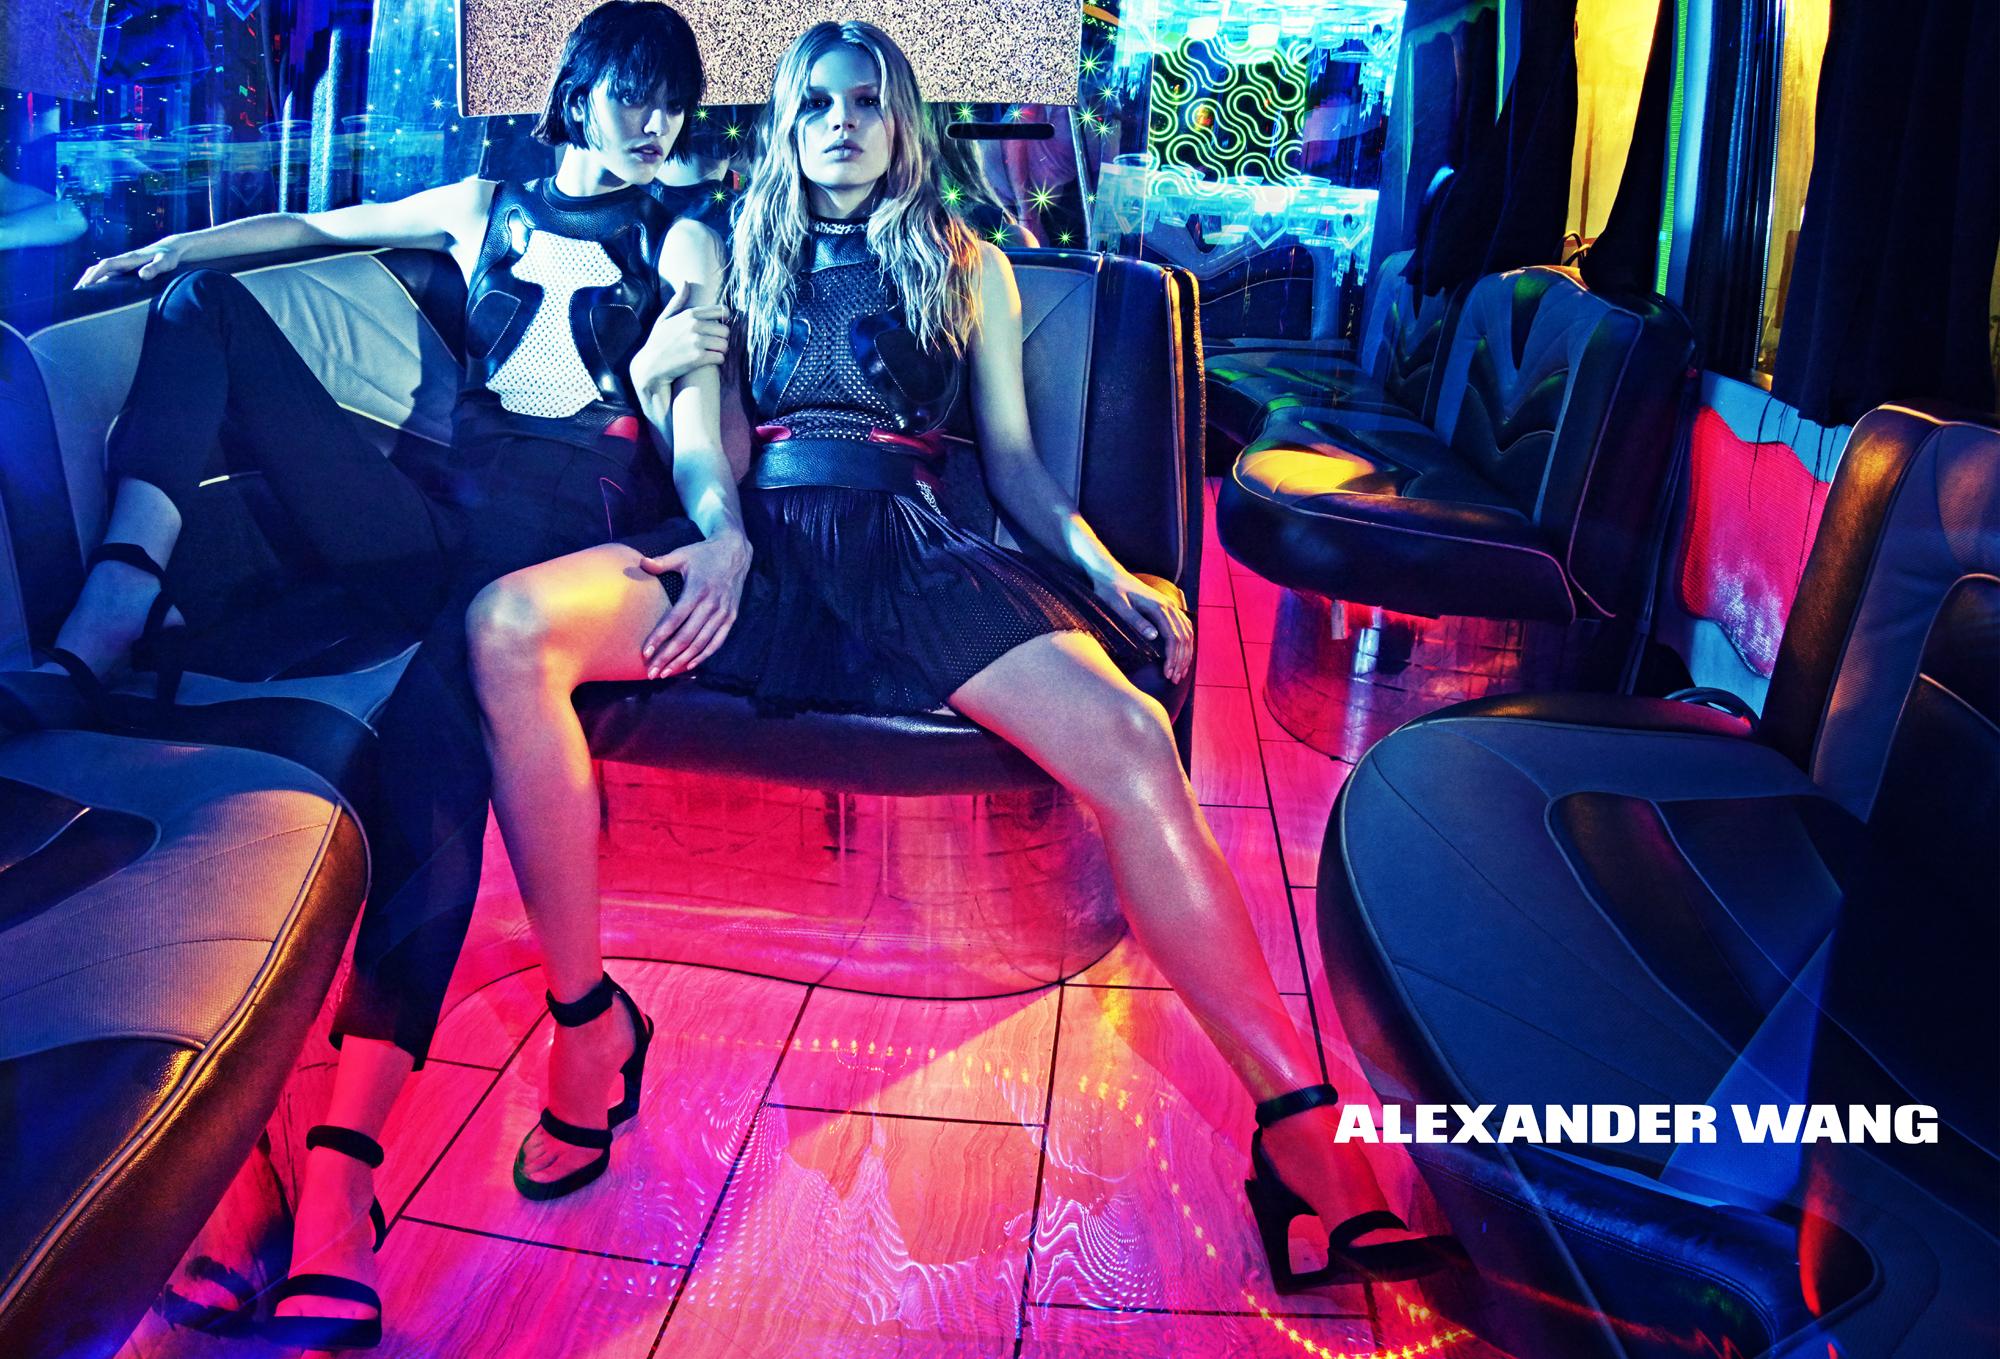 alexander-wang-spring-2015-ad-campaign-04